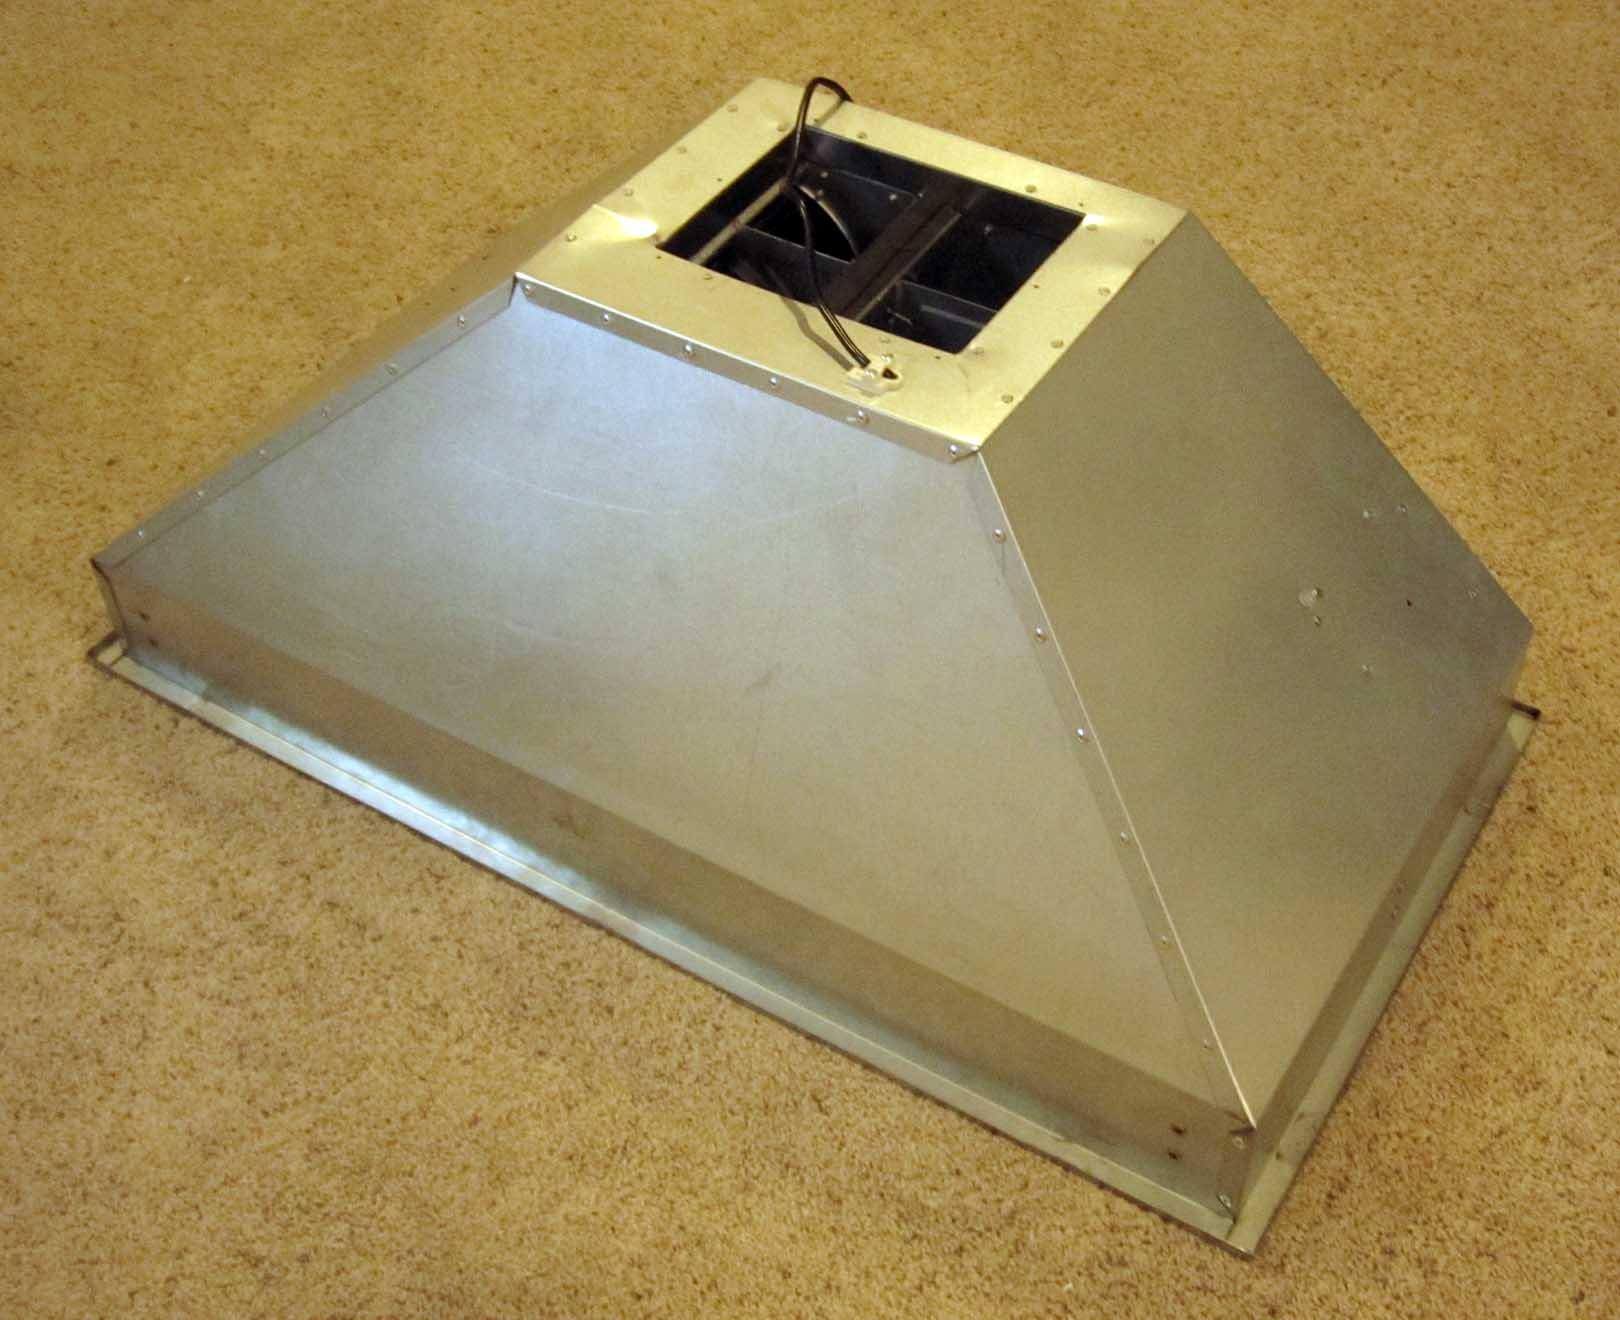 kitchen cabinet liner black mat rugs diy build wood hood vent download easy toy box plans ...